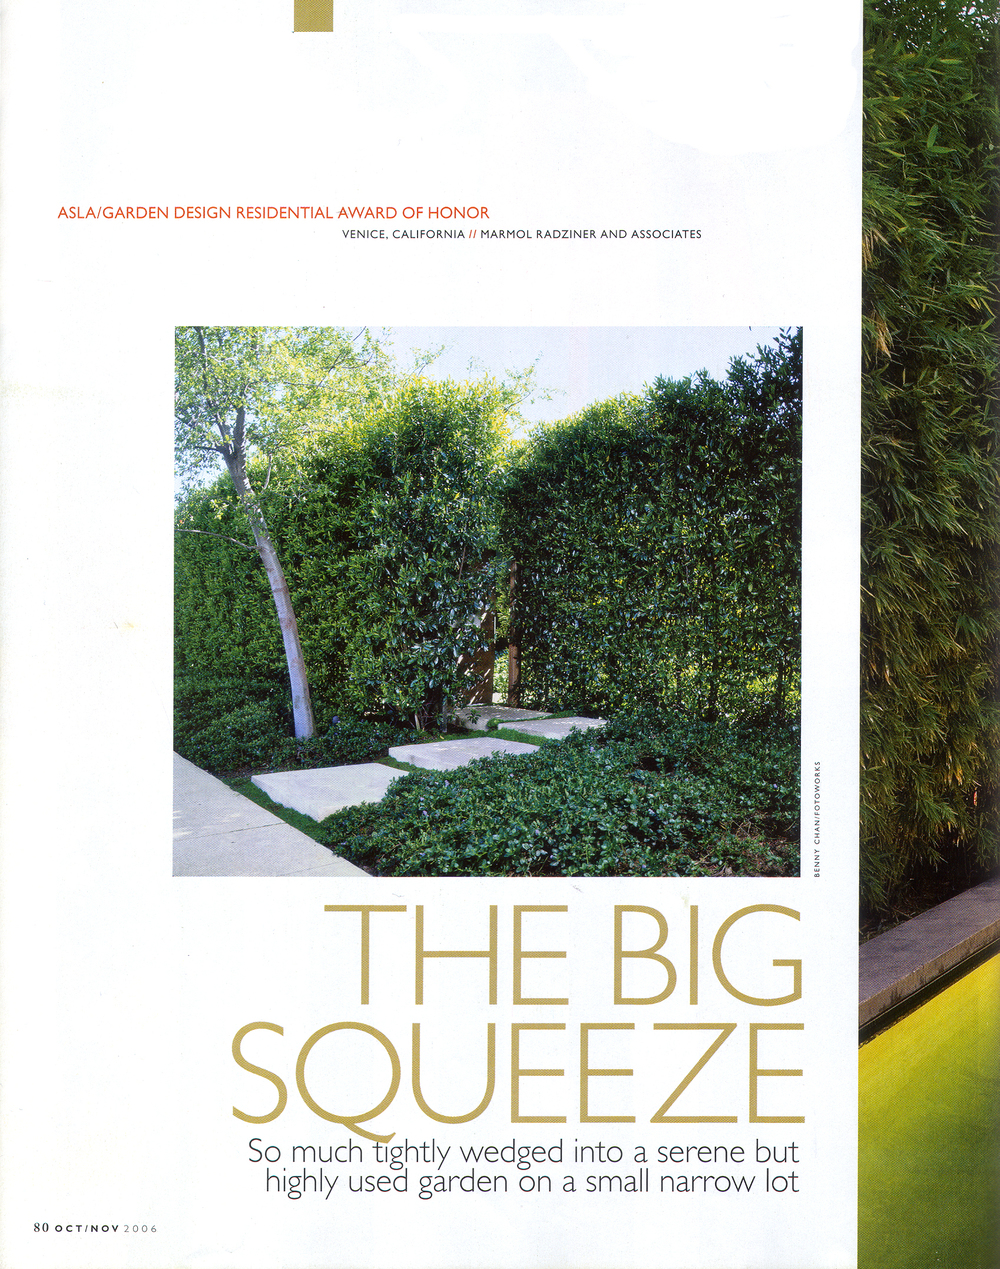 Glencoe-Garden Design 1 -1107.jpg